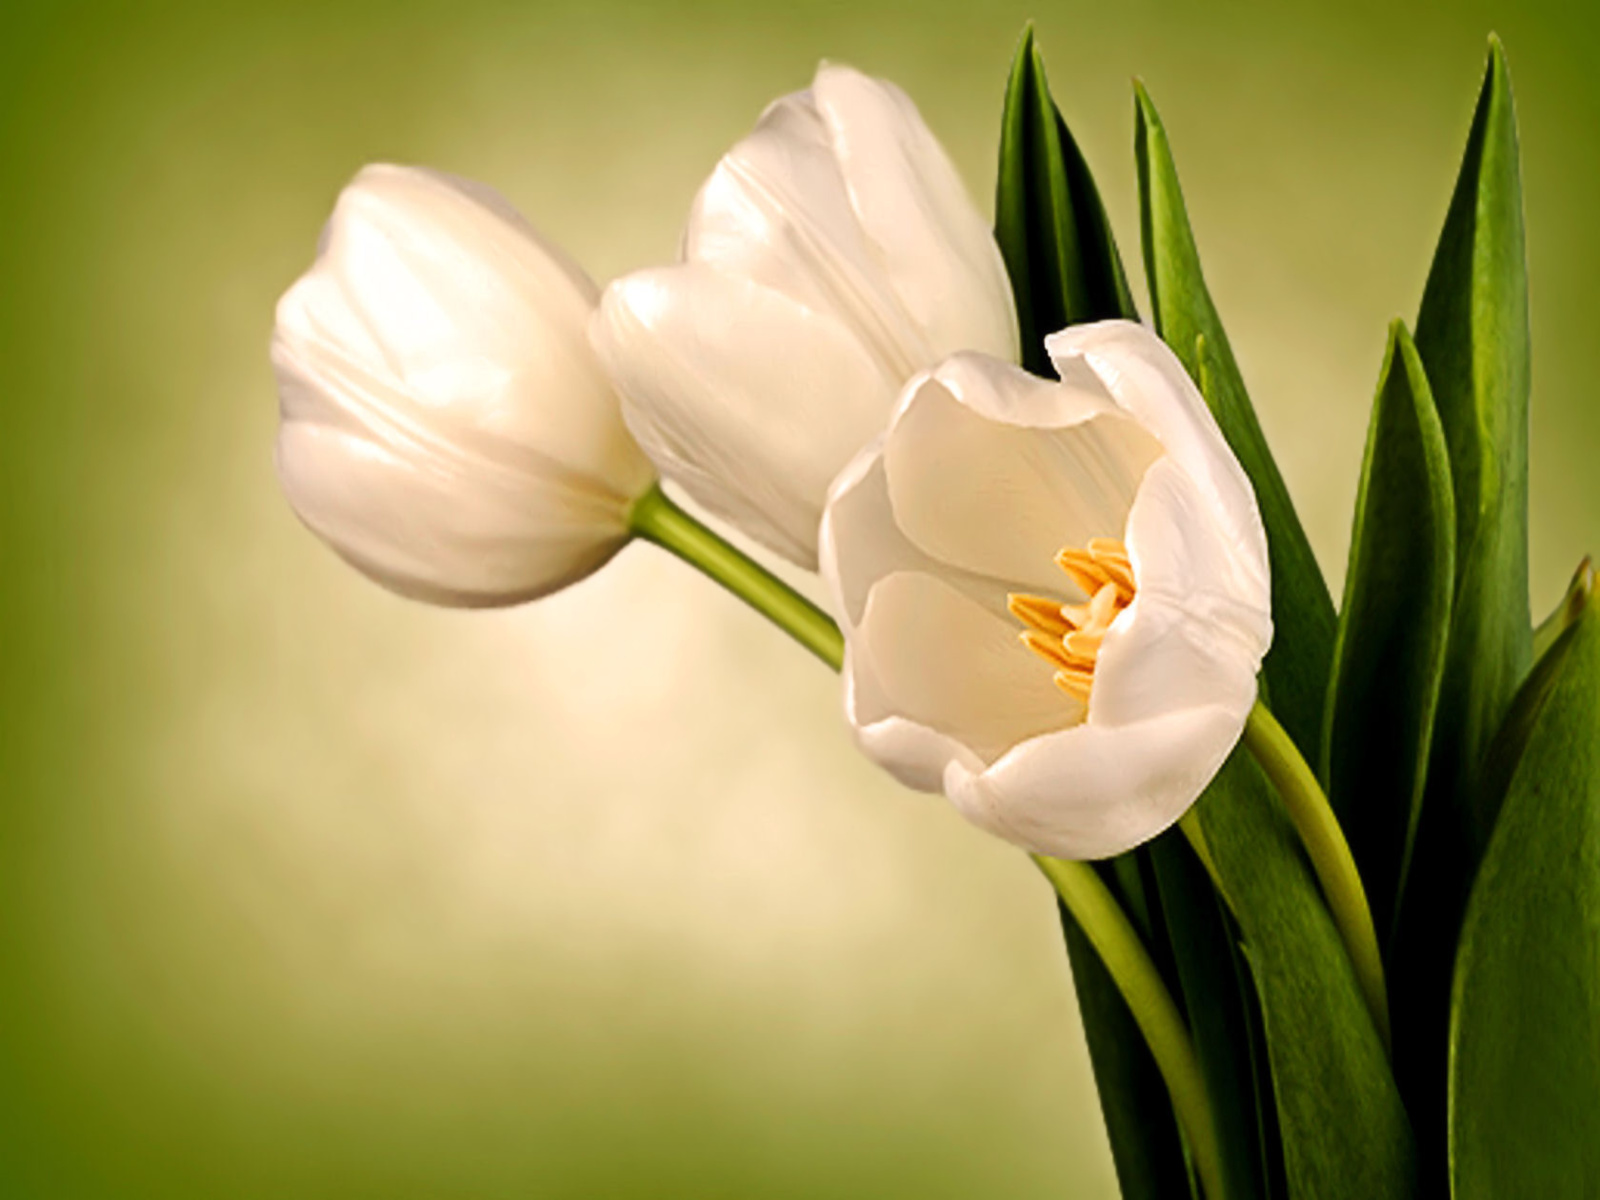 http://2.bp.blogspot.com/-Ccmhyt43pSg/TkzS1E_YOxI/AAAAAAAAAkY/JfoWFWBD13A/s1600/tulips.jpg